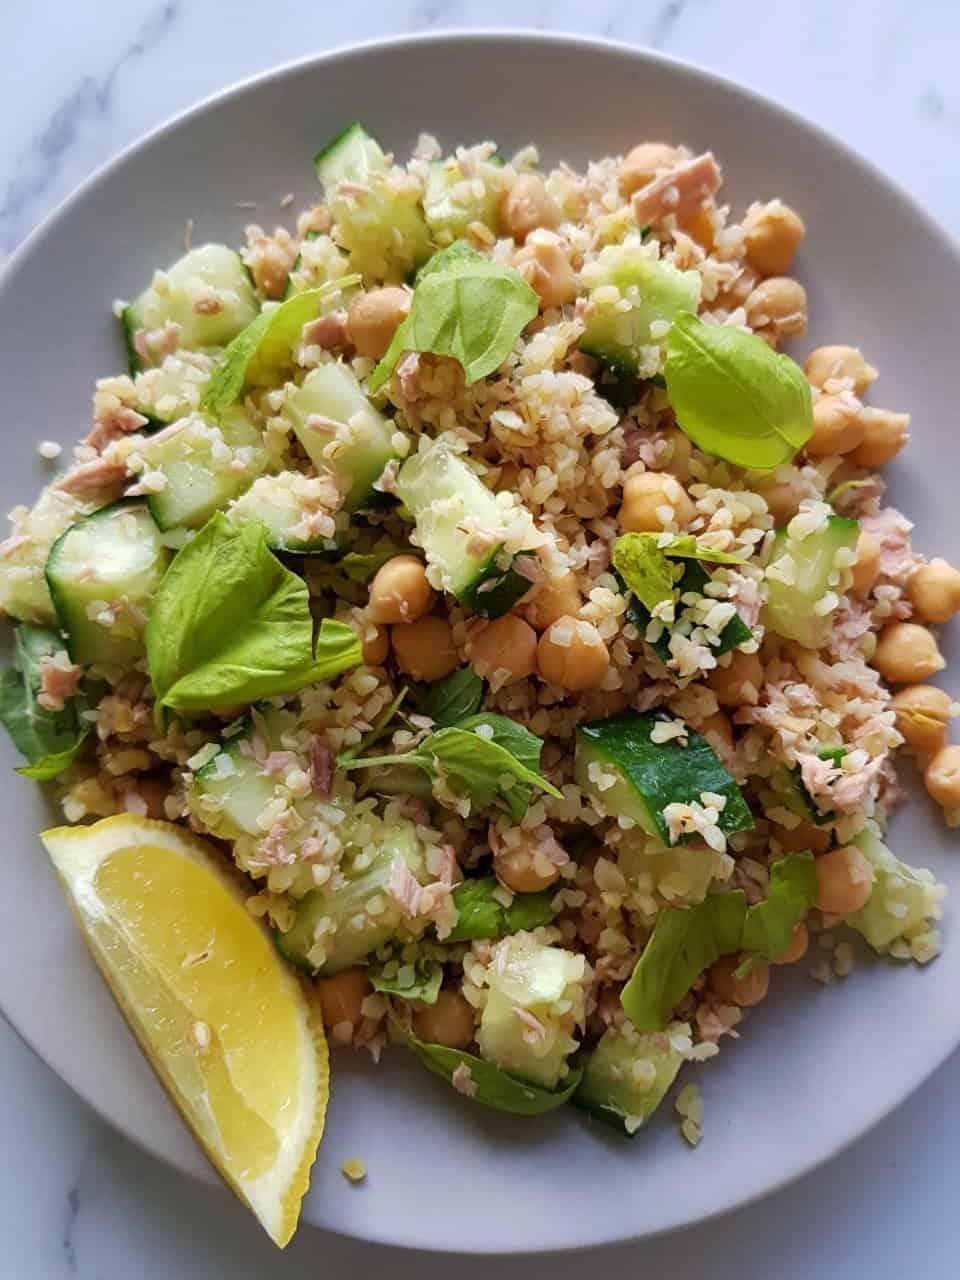 Tuna bulgur salad on a plate with a slice of lemon on the side.